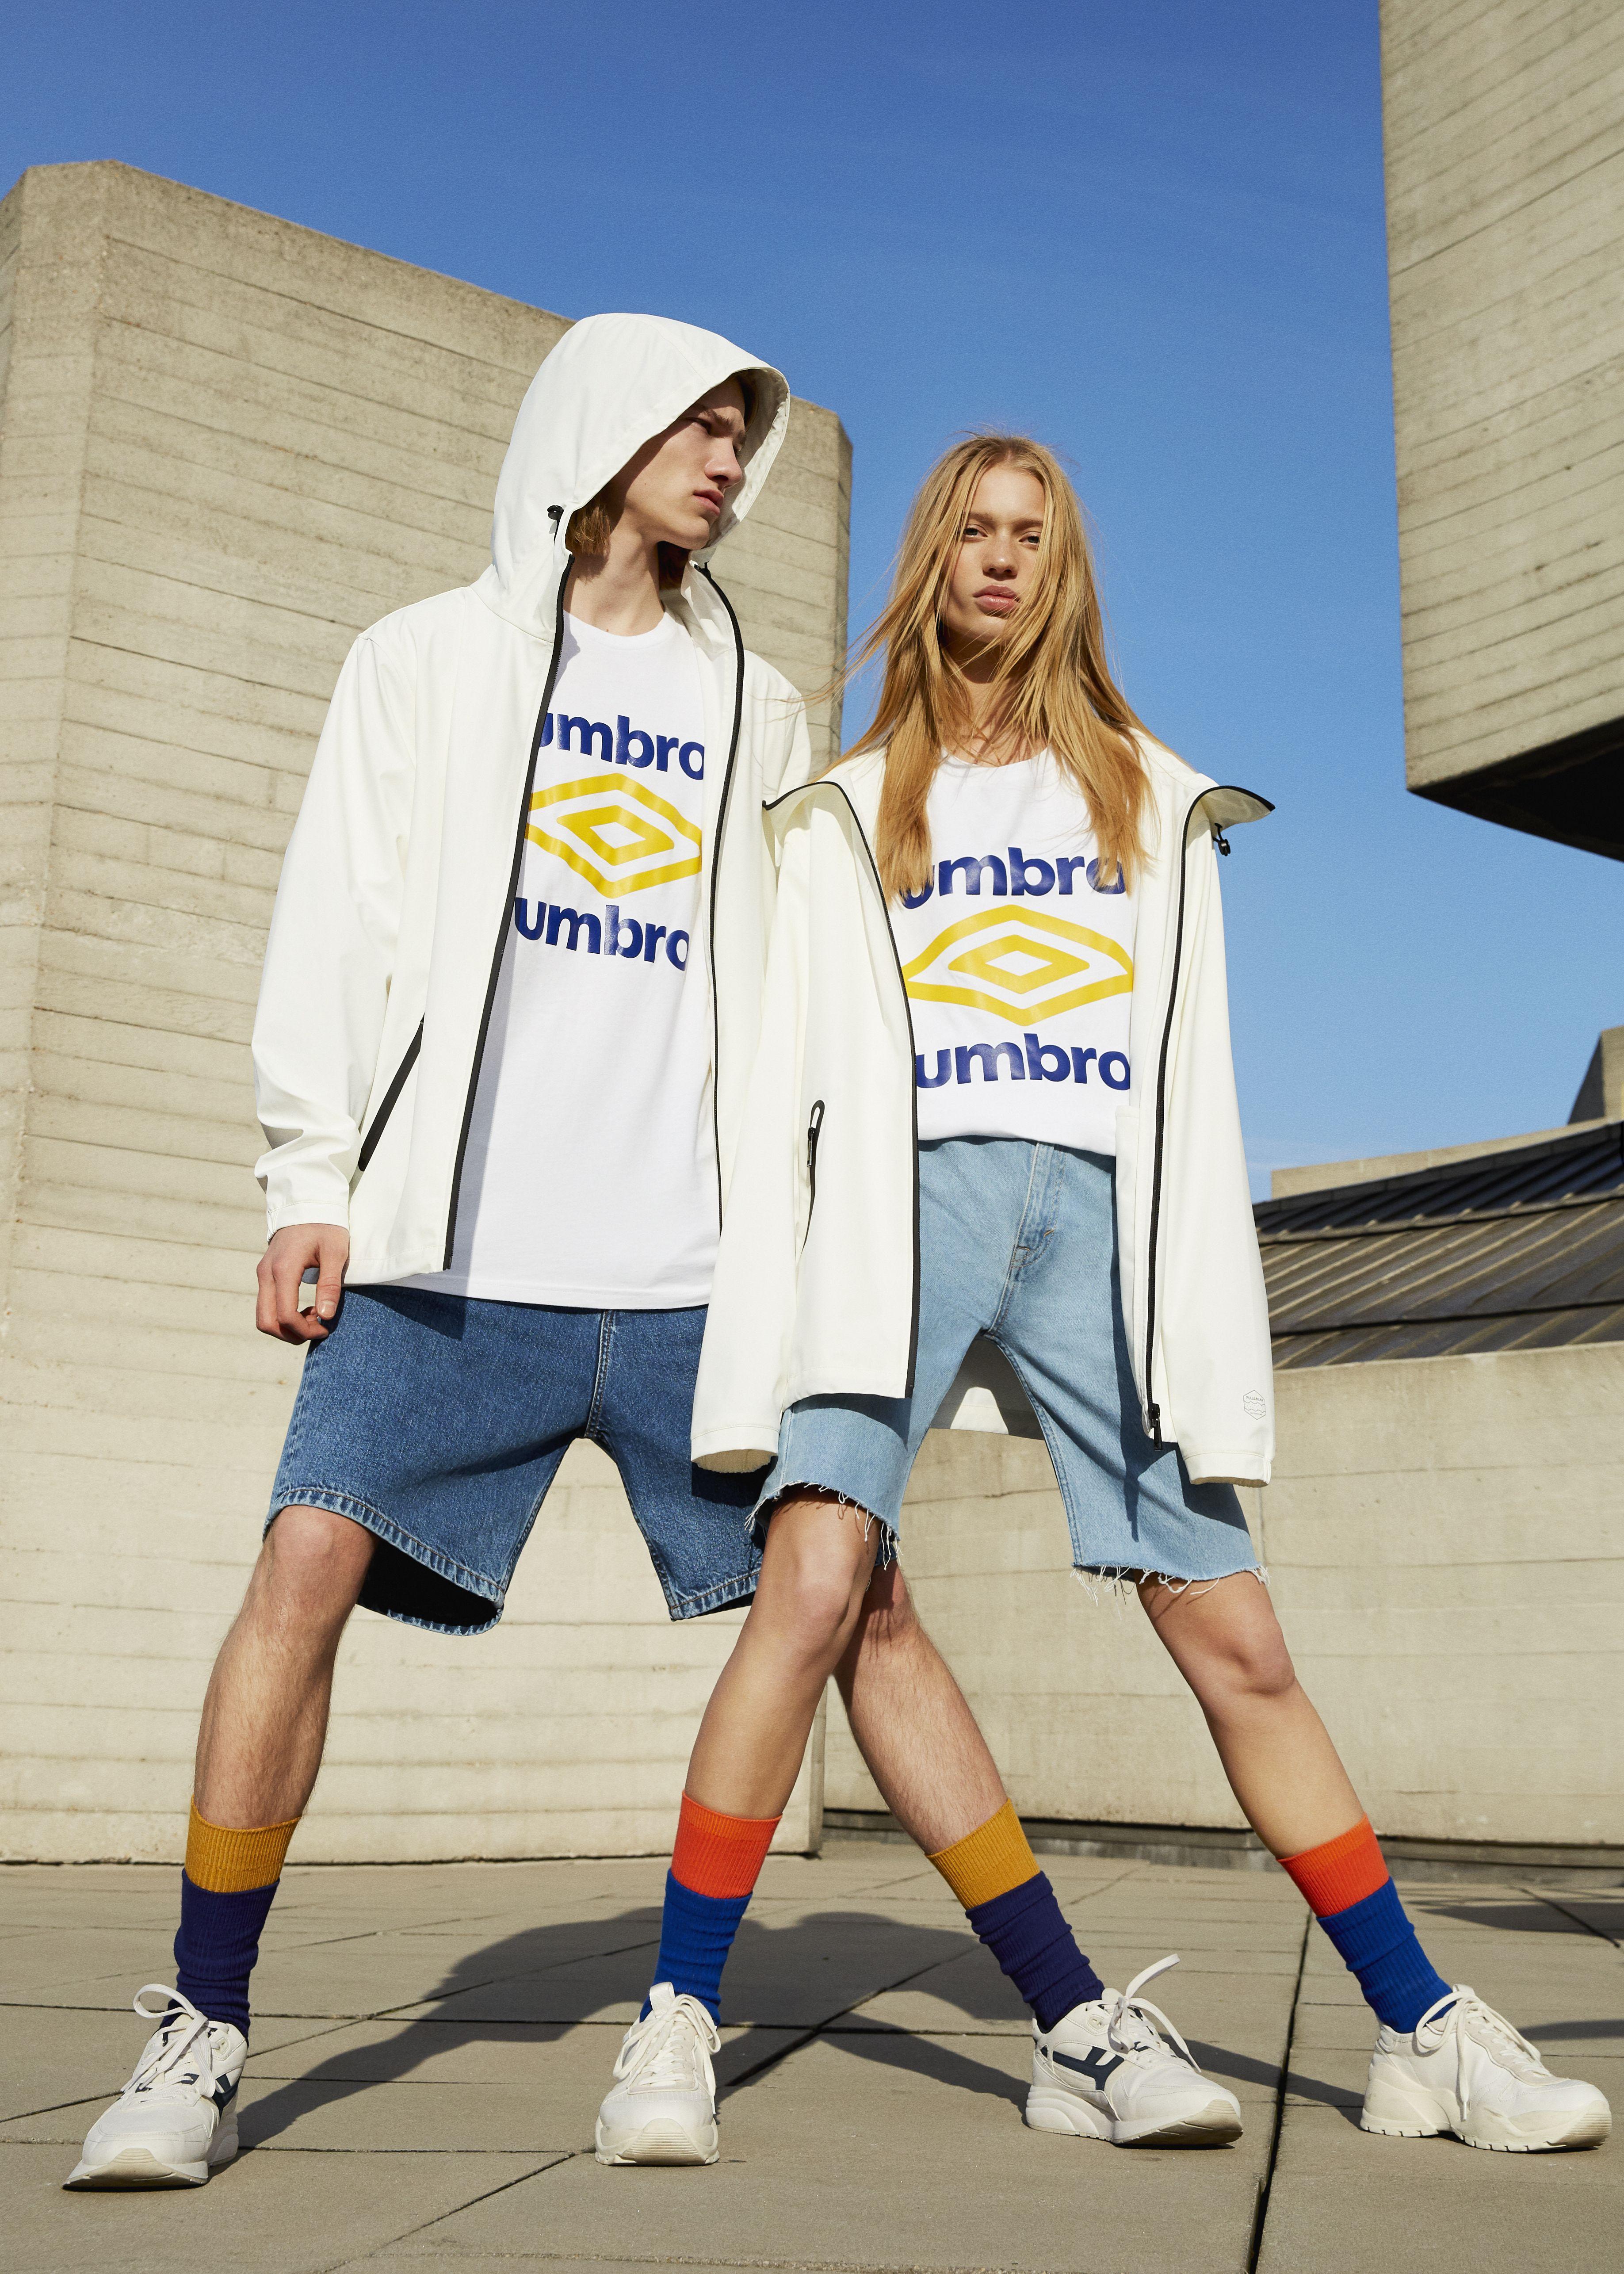 umbro fashion